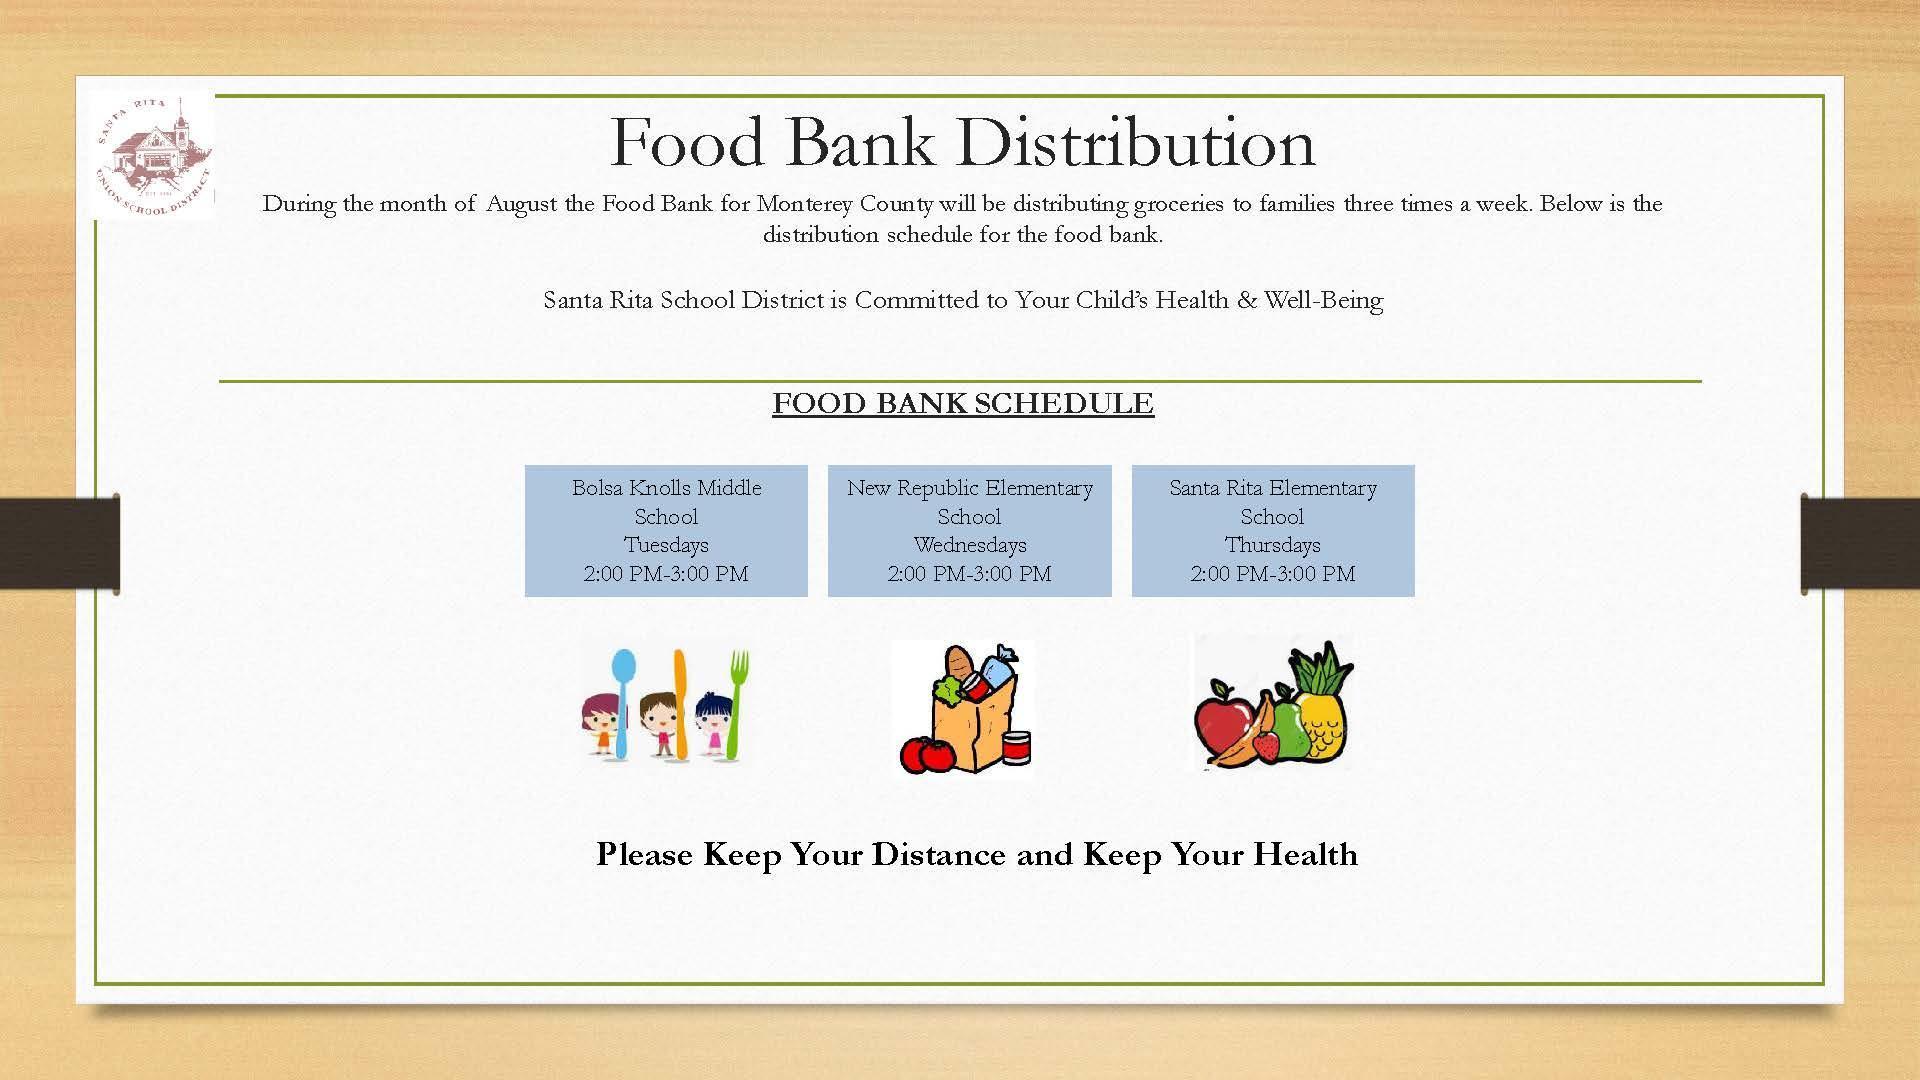 Food Bank Information